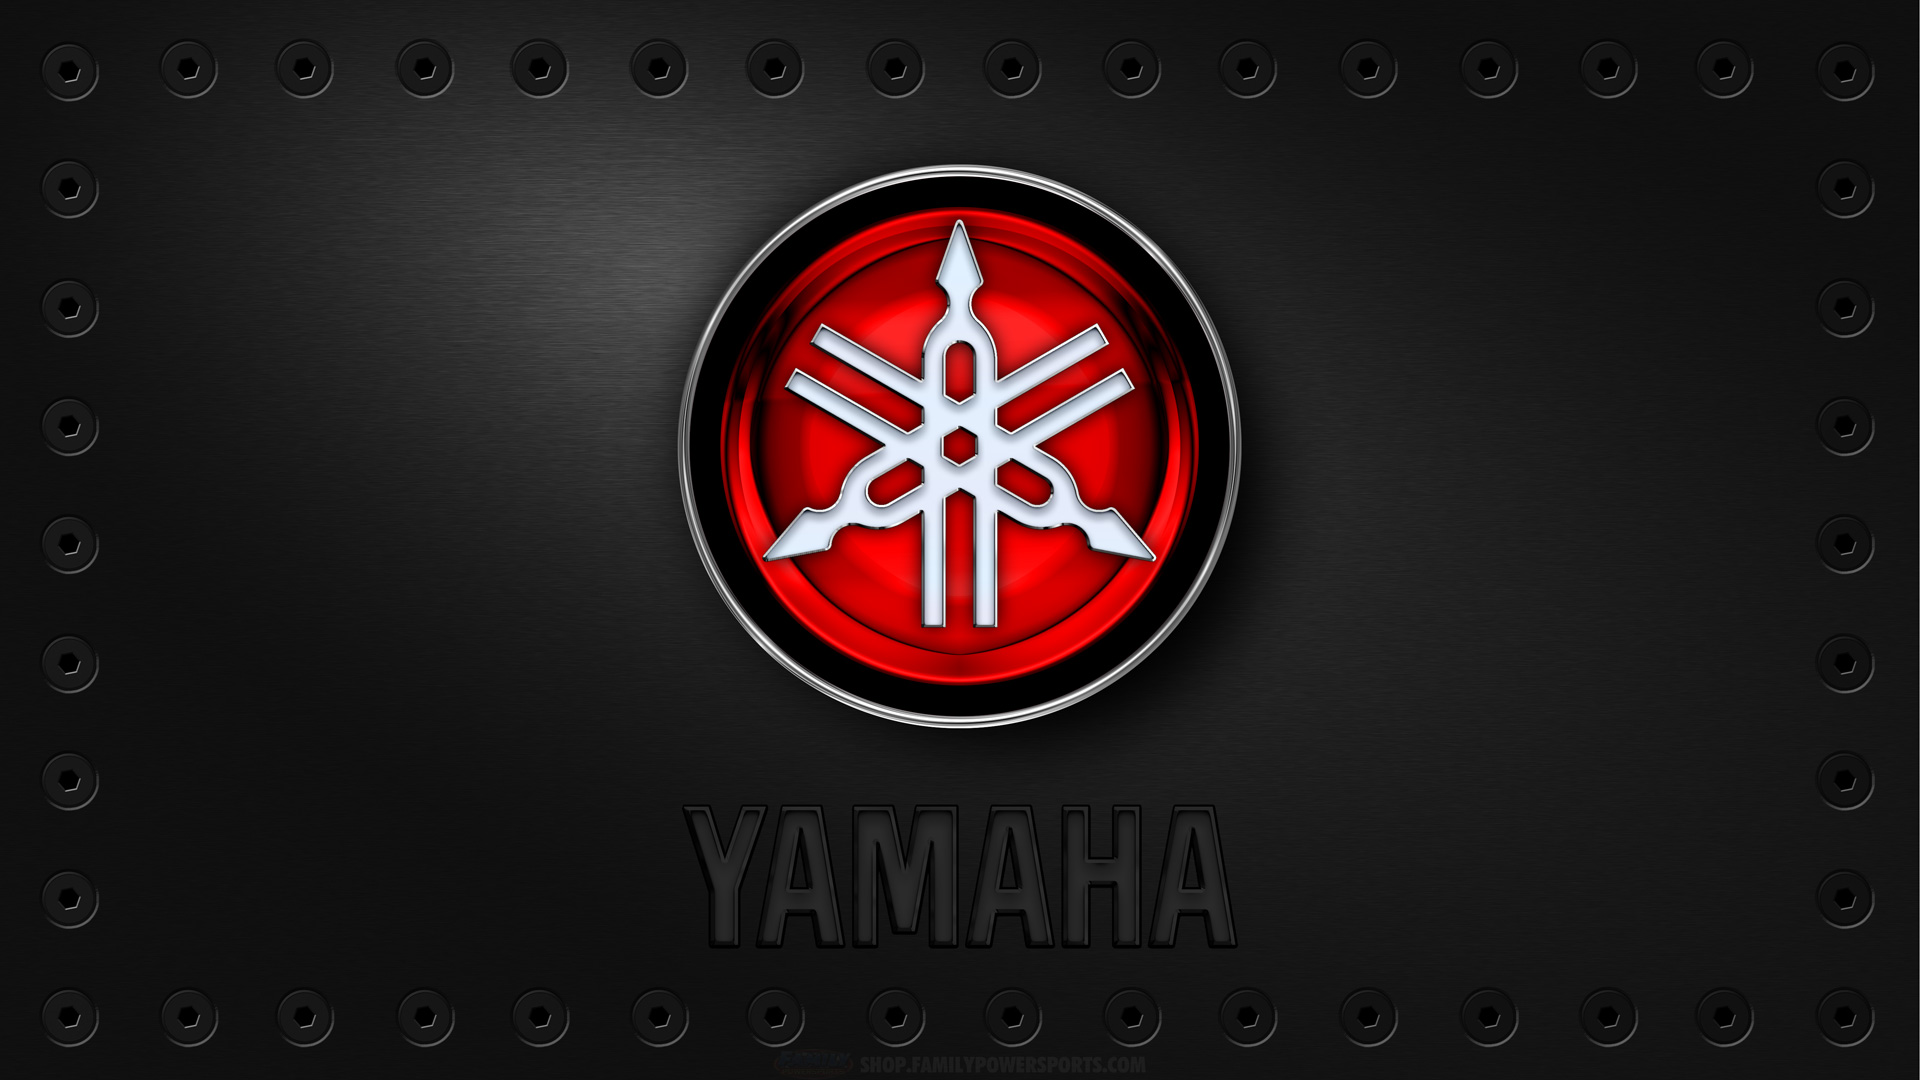 yamaha logo wallpaper 2 1920x1080